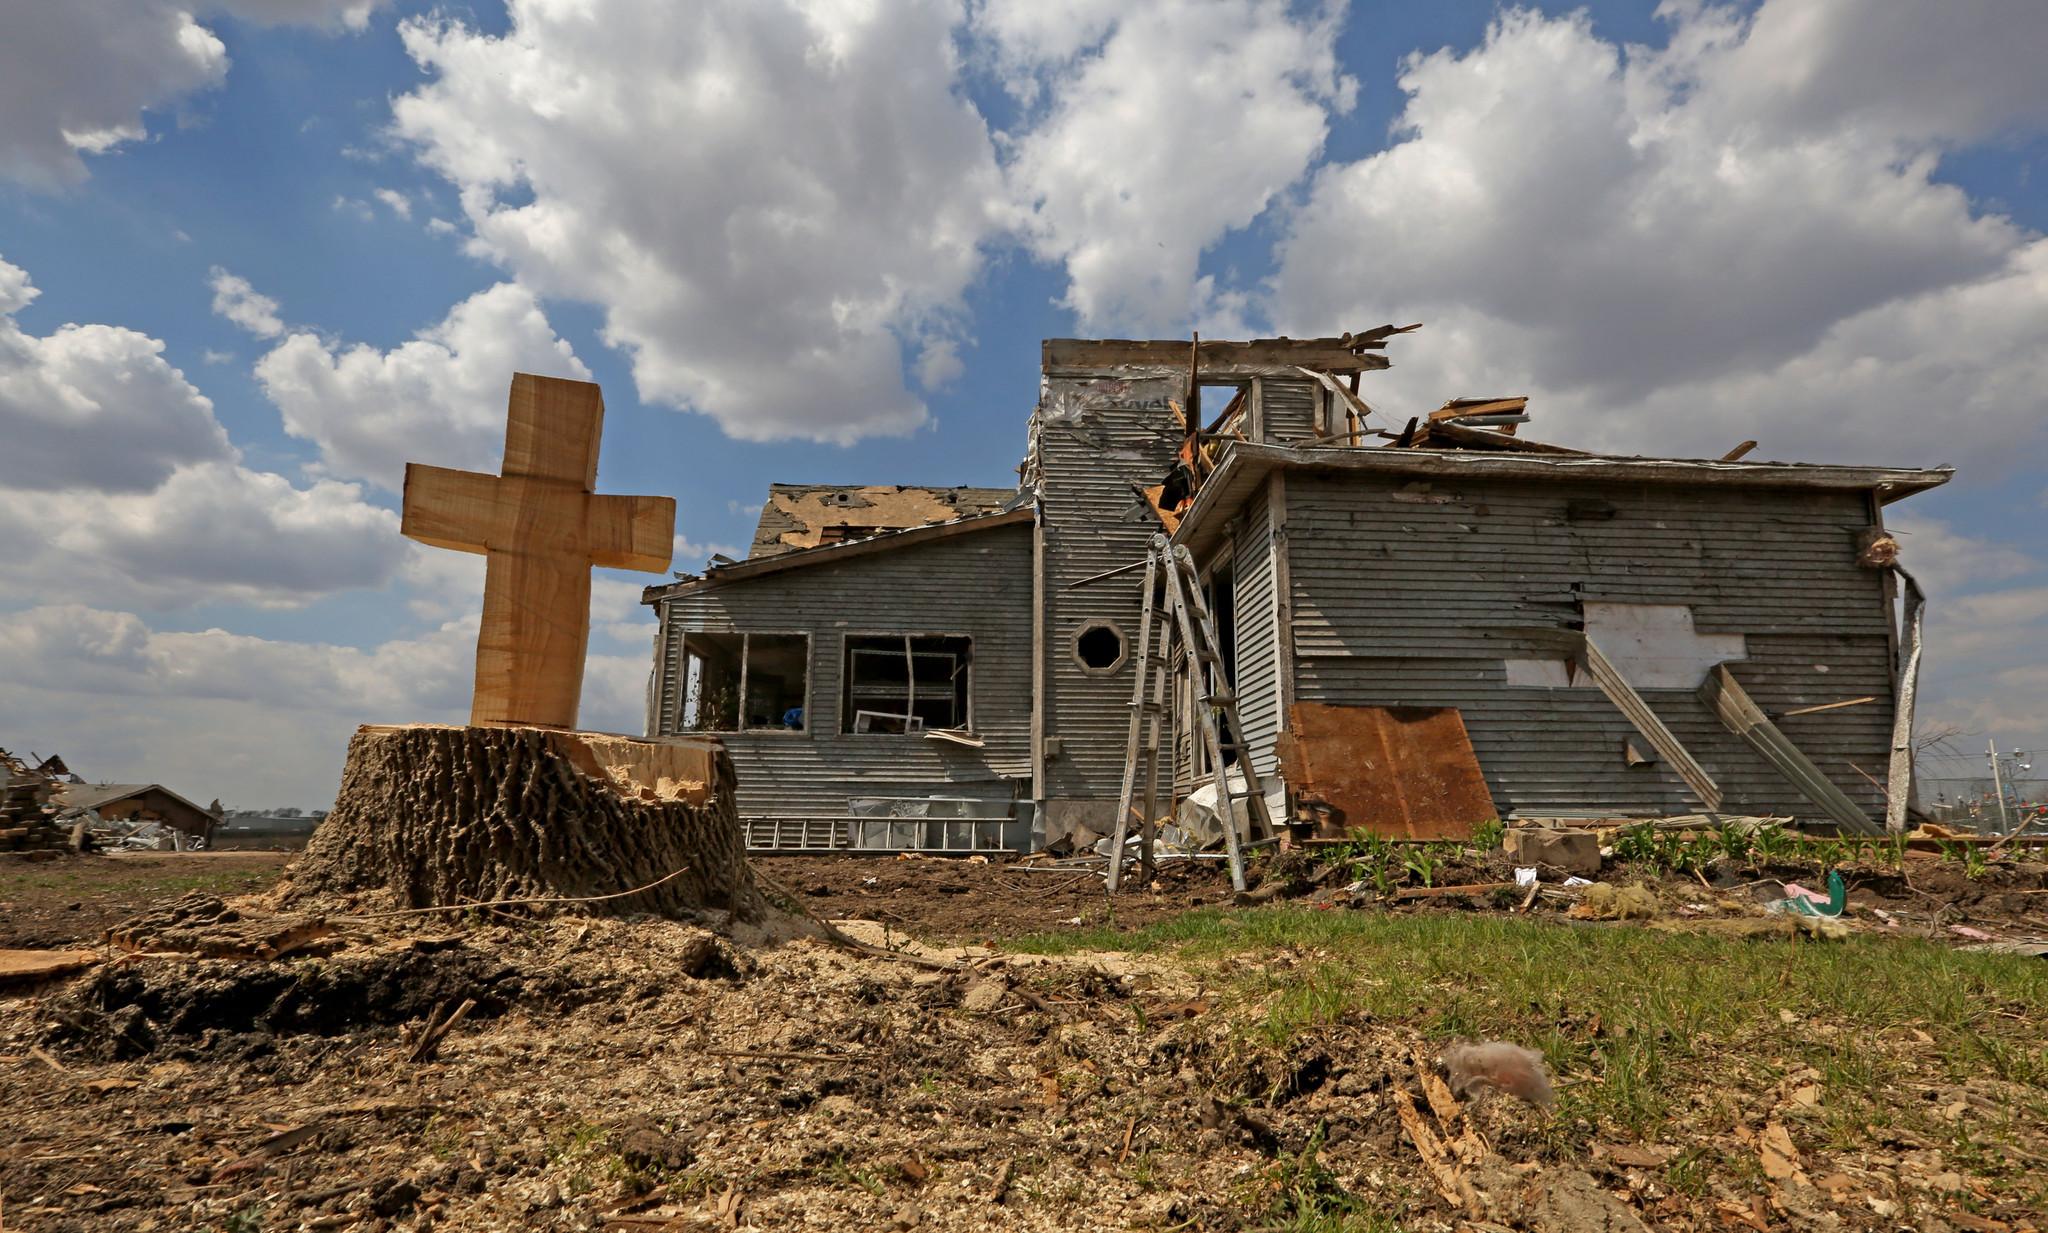 Illinois Tornado Raises Concerns On Warnings In Rural